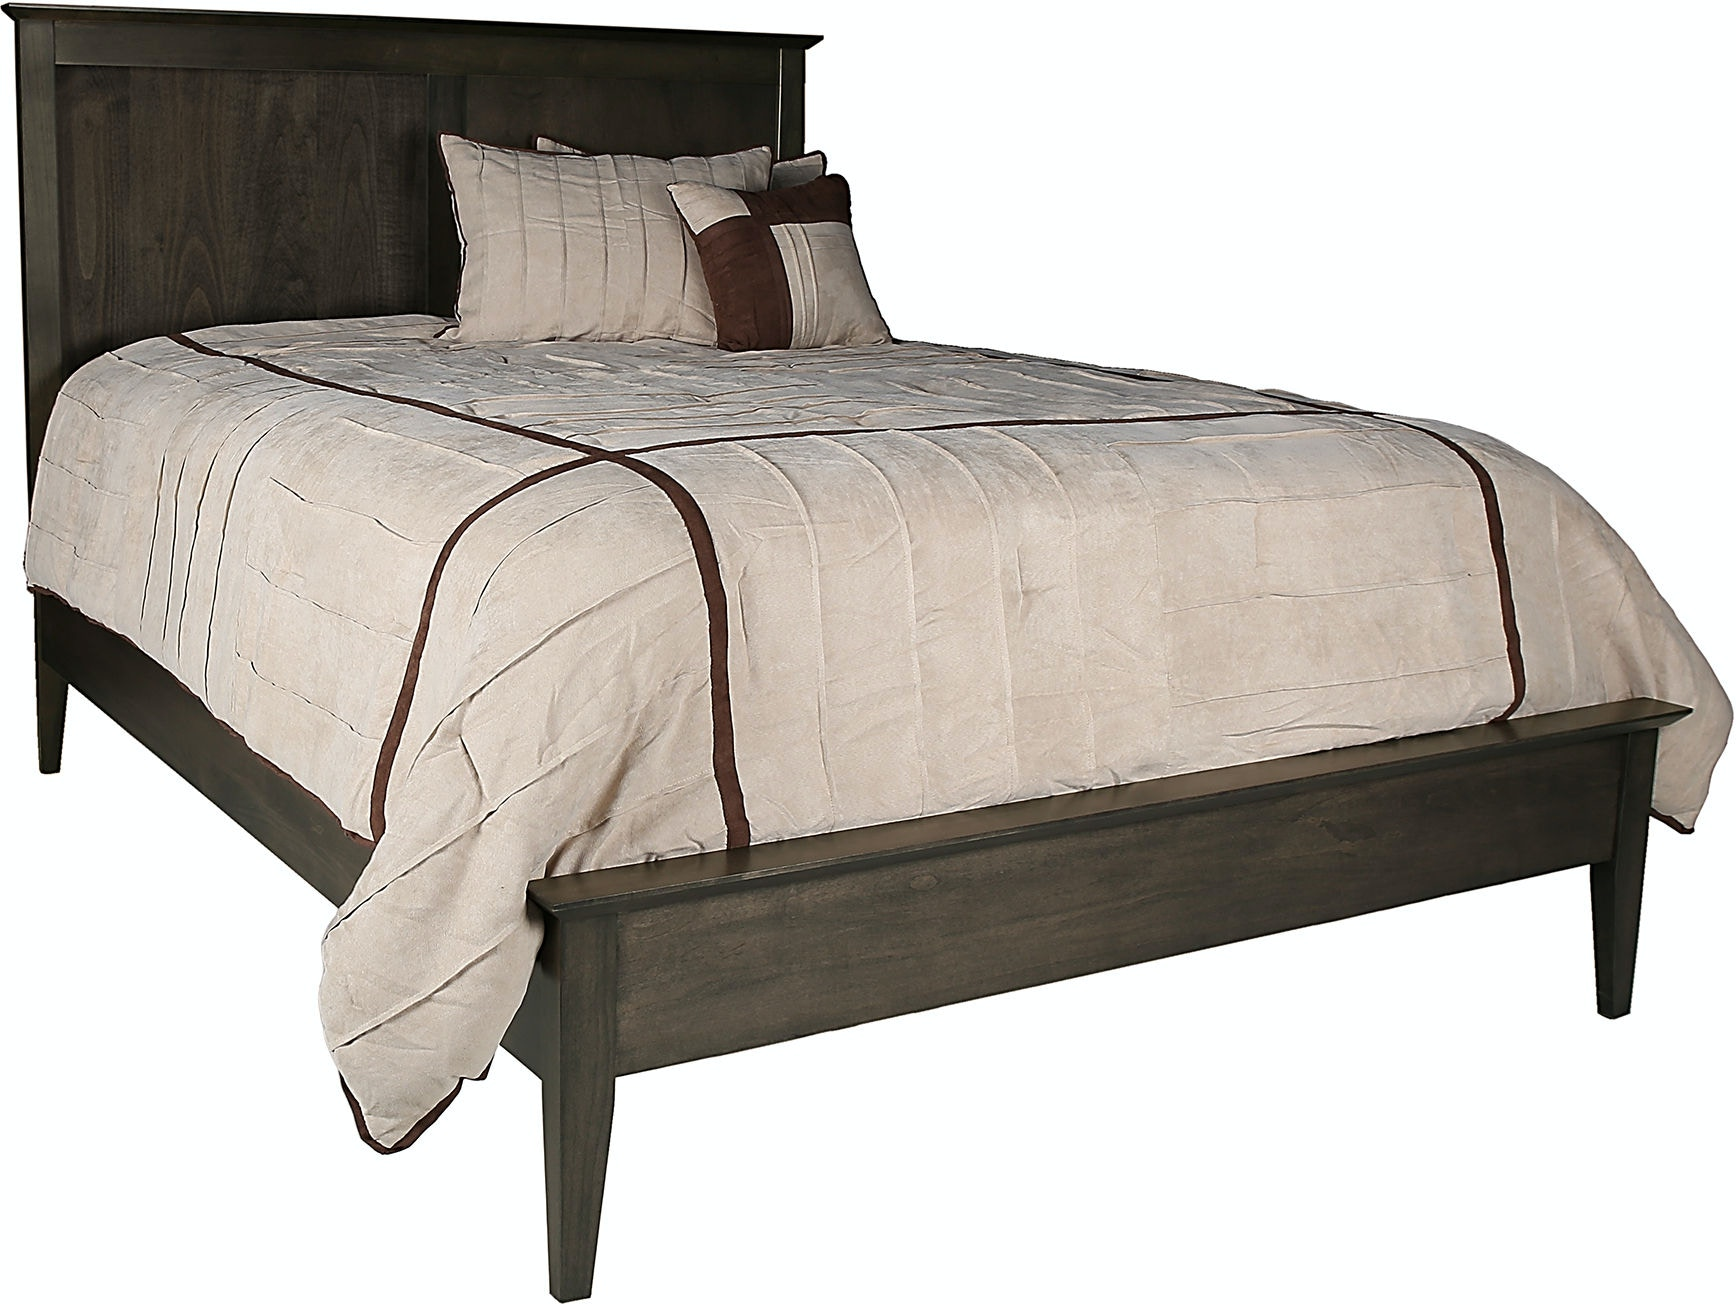 Pictures Of Beds bedroom beds - penny mustard - milwaukee, wisconsin